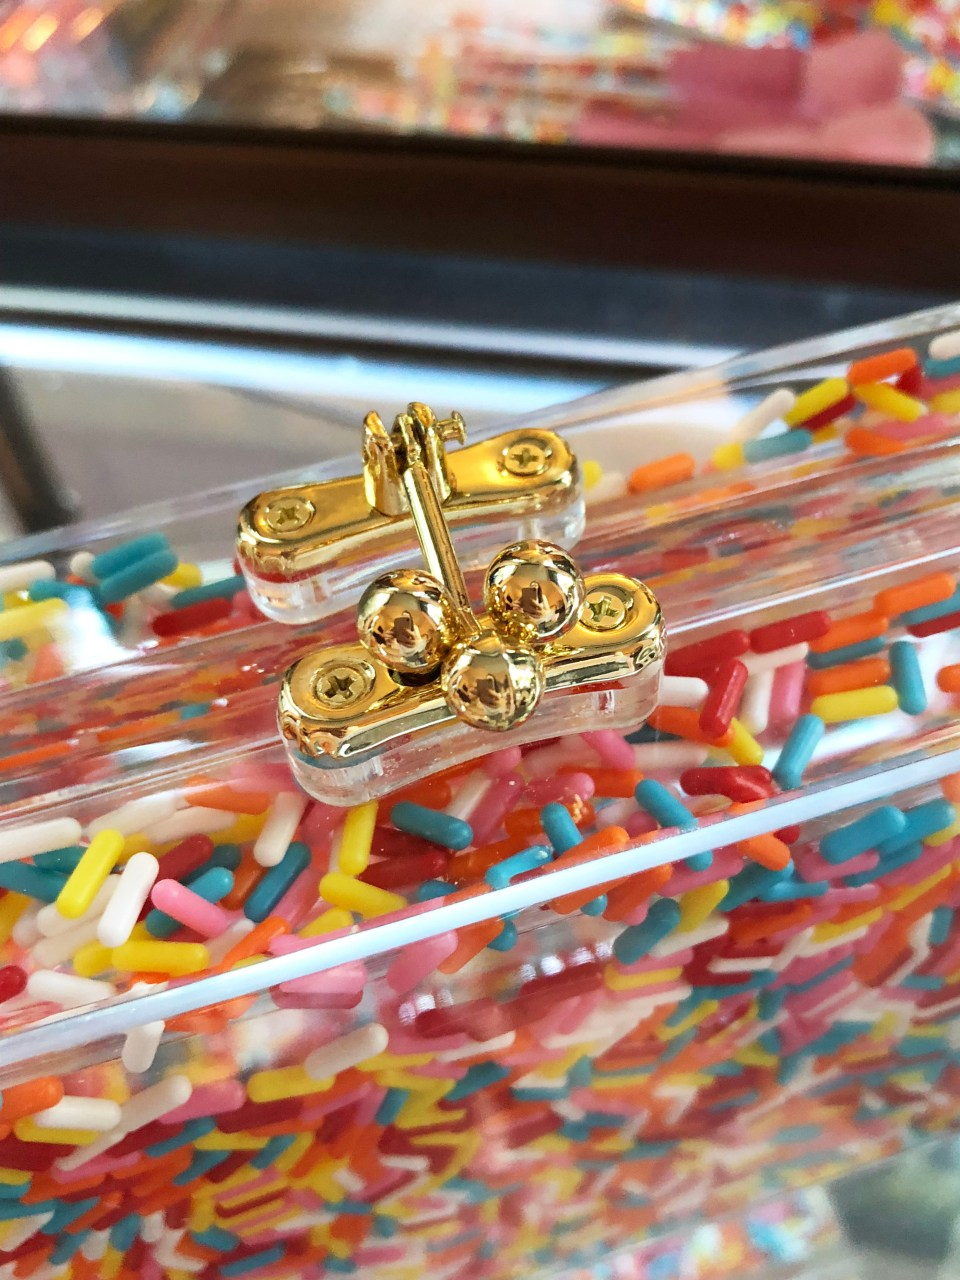 Museum of Ice Cream x Sephora - Sprinkle Clutch 1